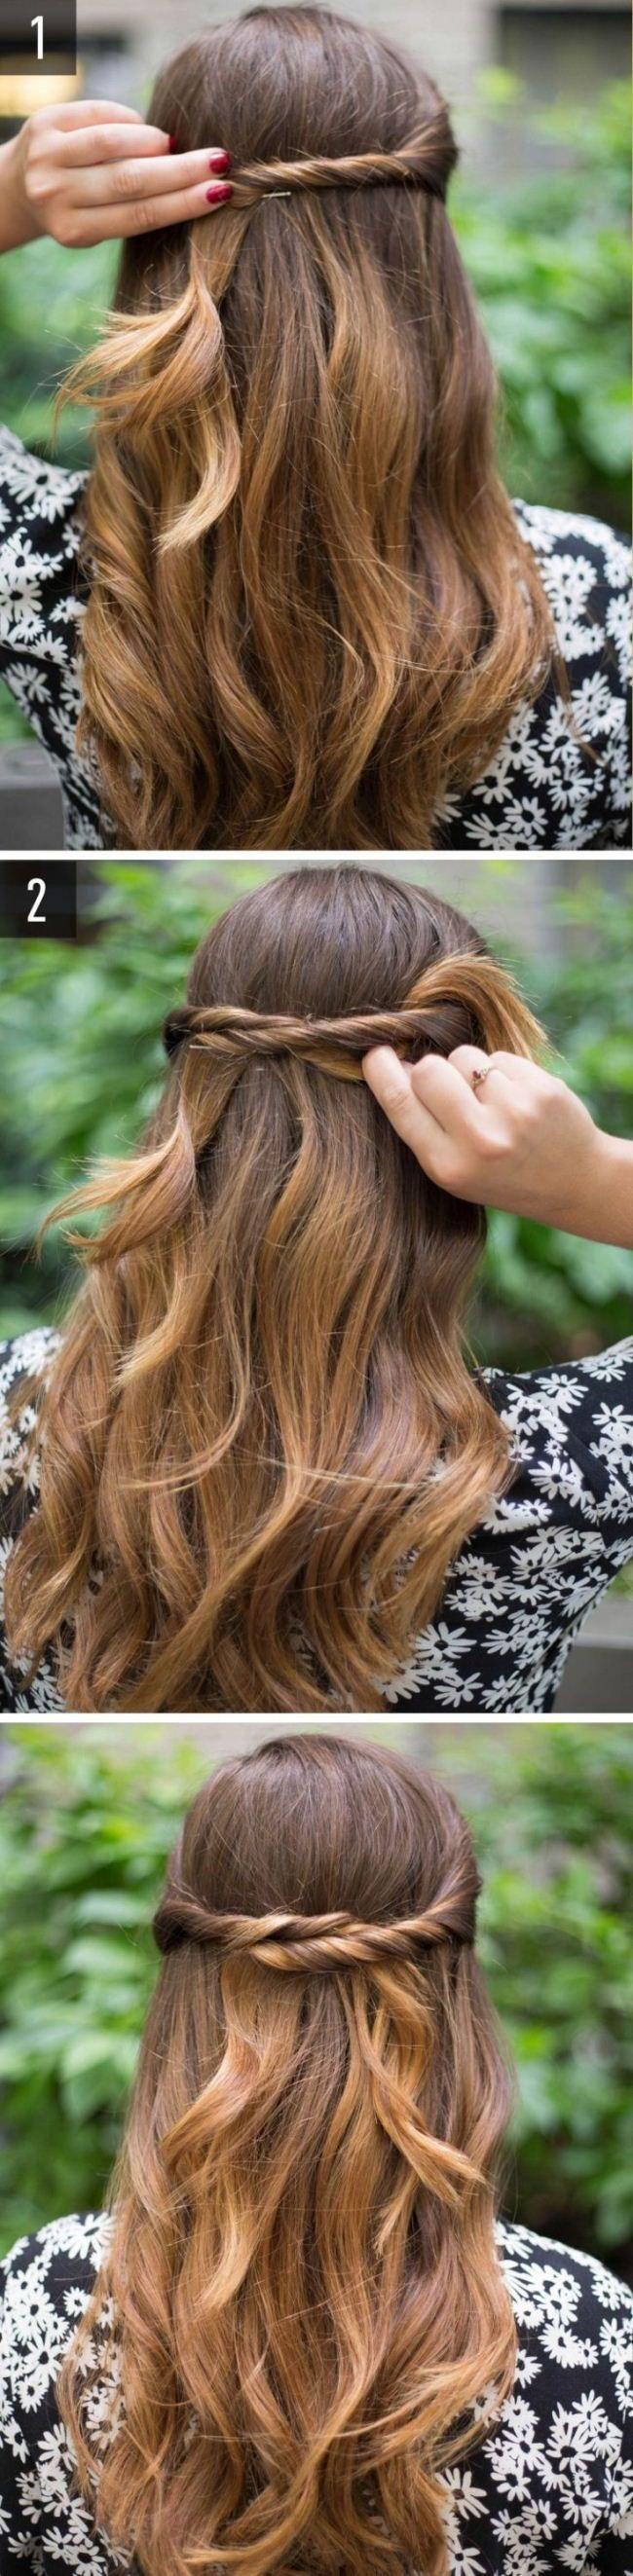 Eid Hairstyle 2017 Step By Step For Pakistani Girls Allfashionhug